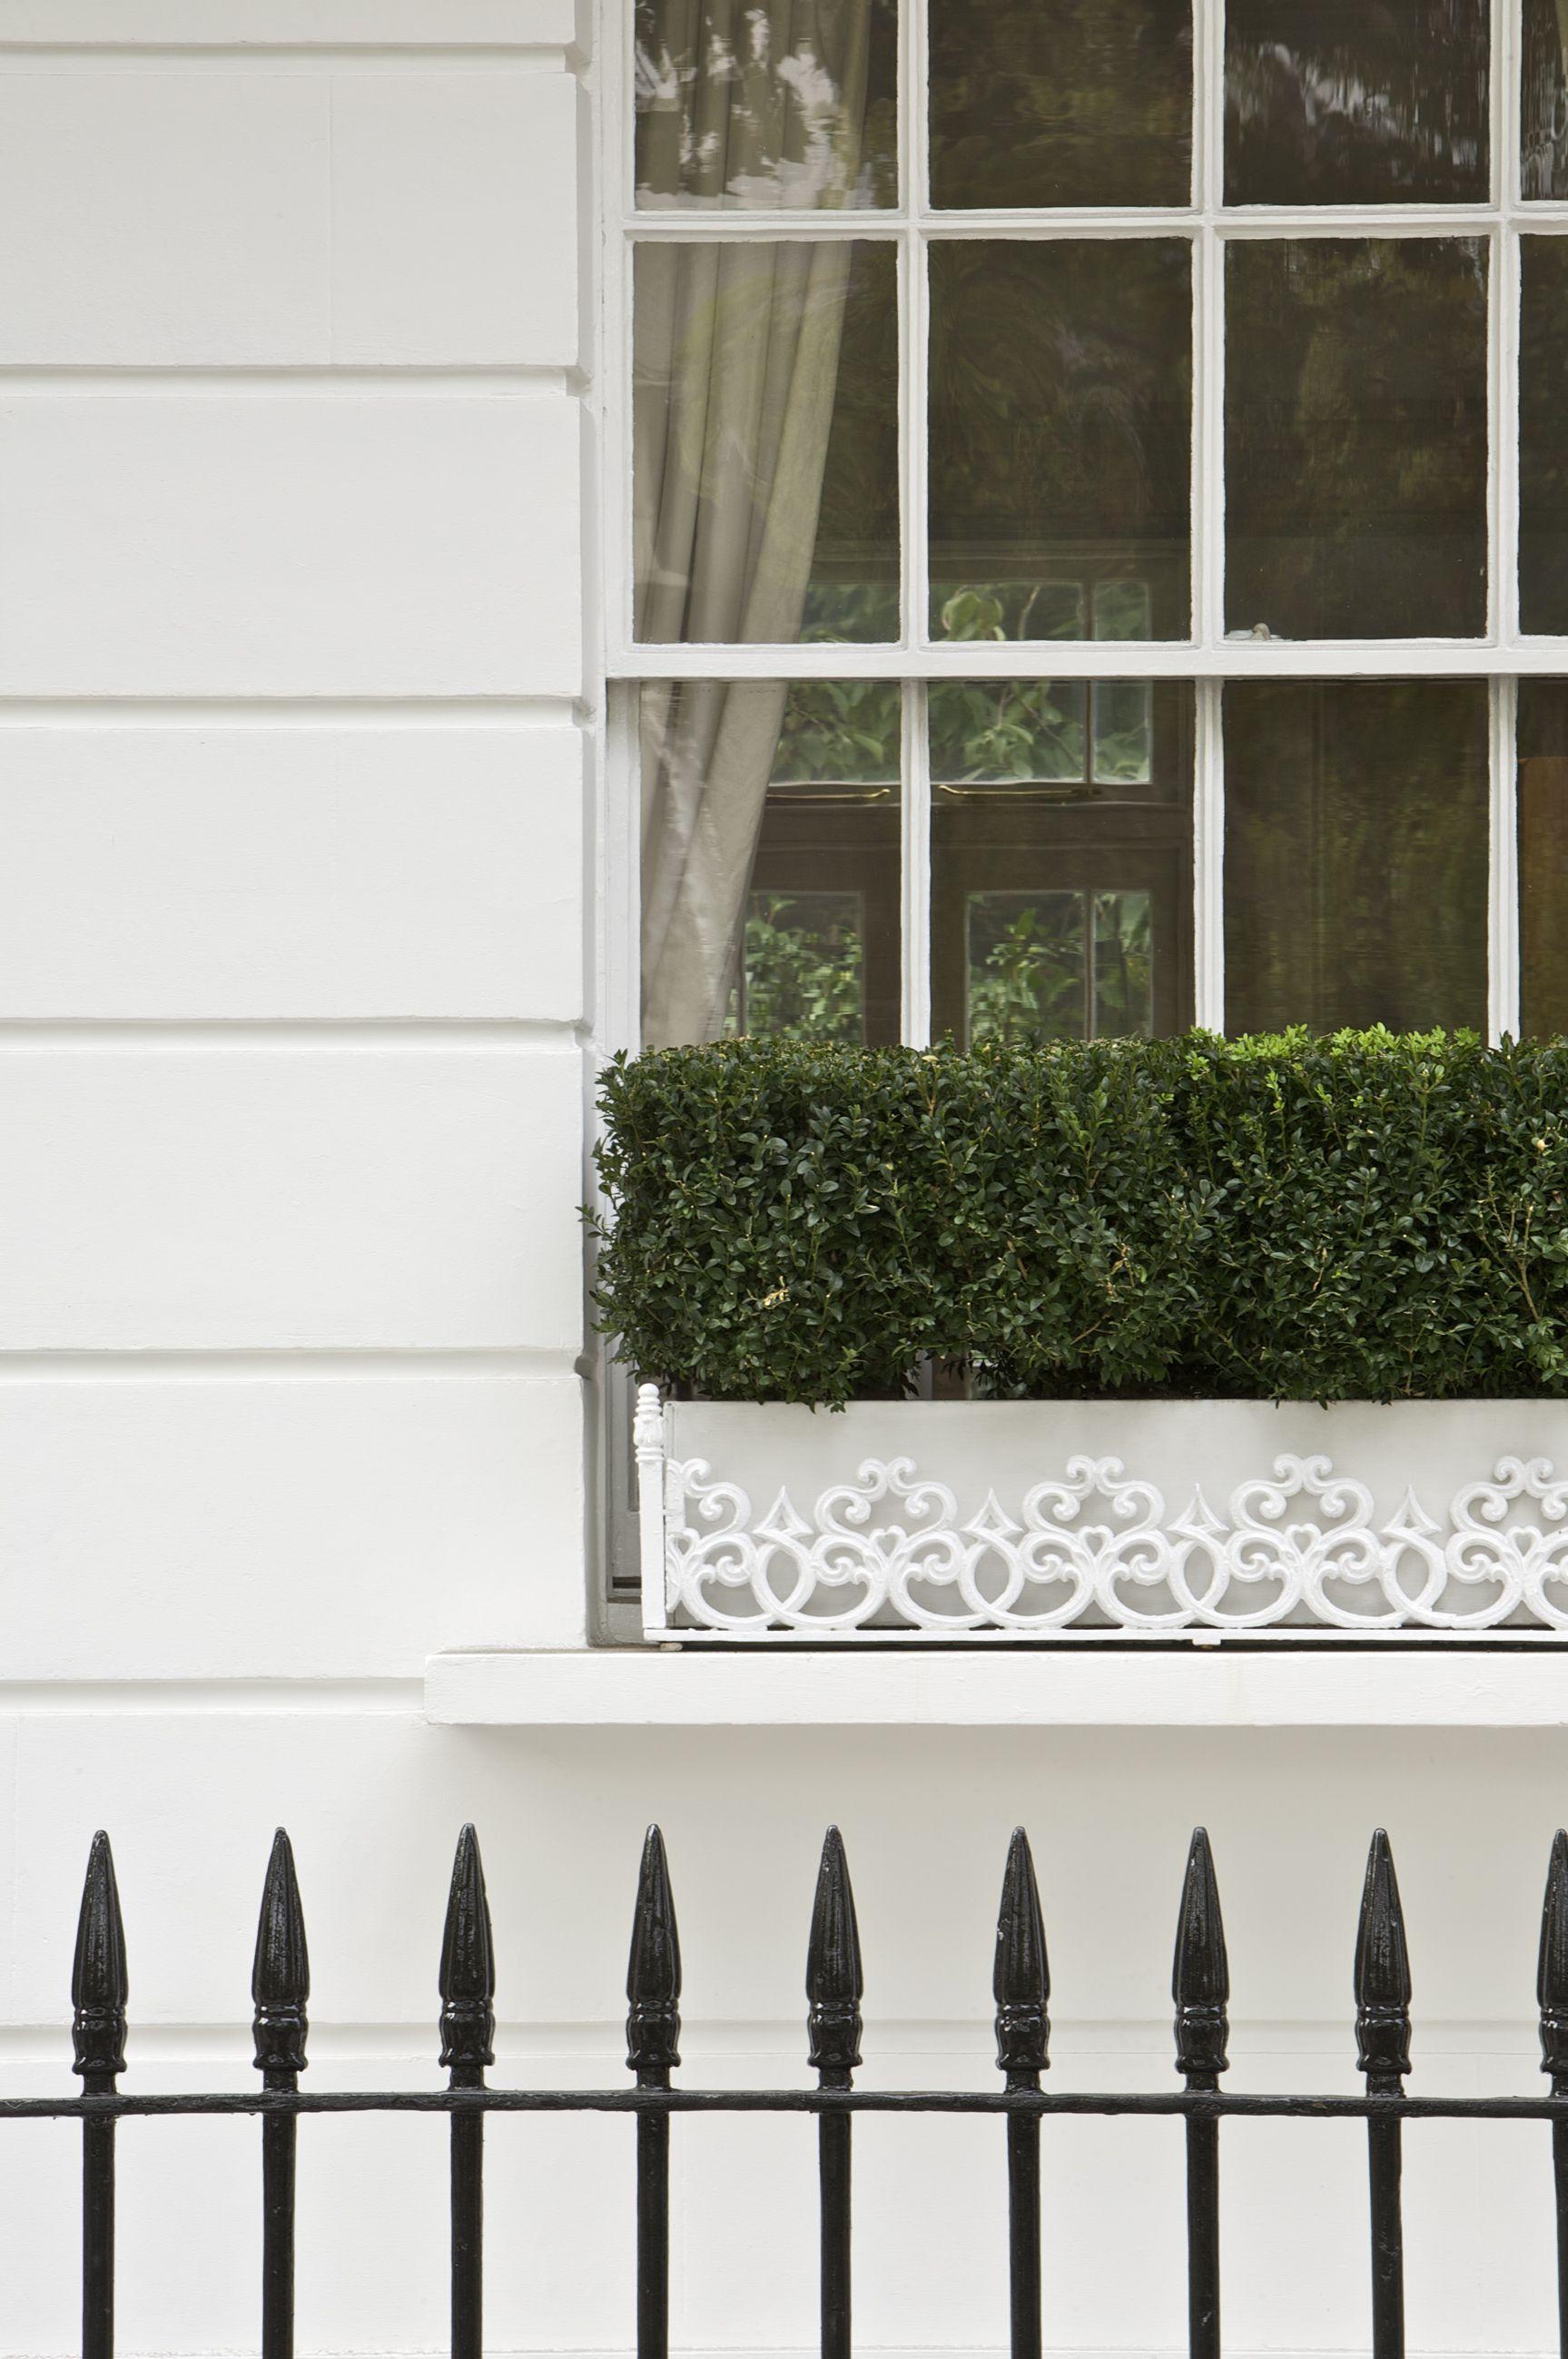 Wall in farrow ball 39 s wimborne white exterior masonry - Farrow and ball exterior masonry paint ideas ...